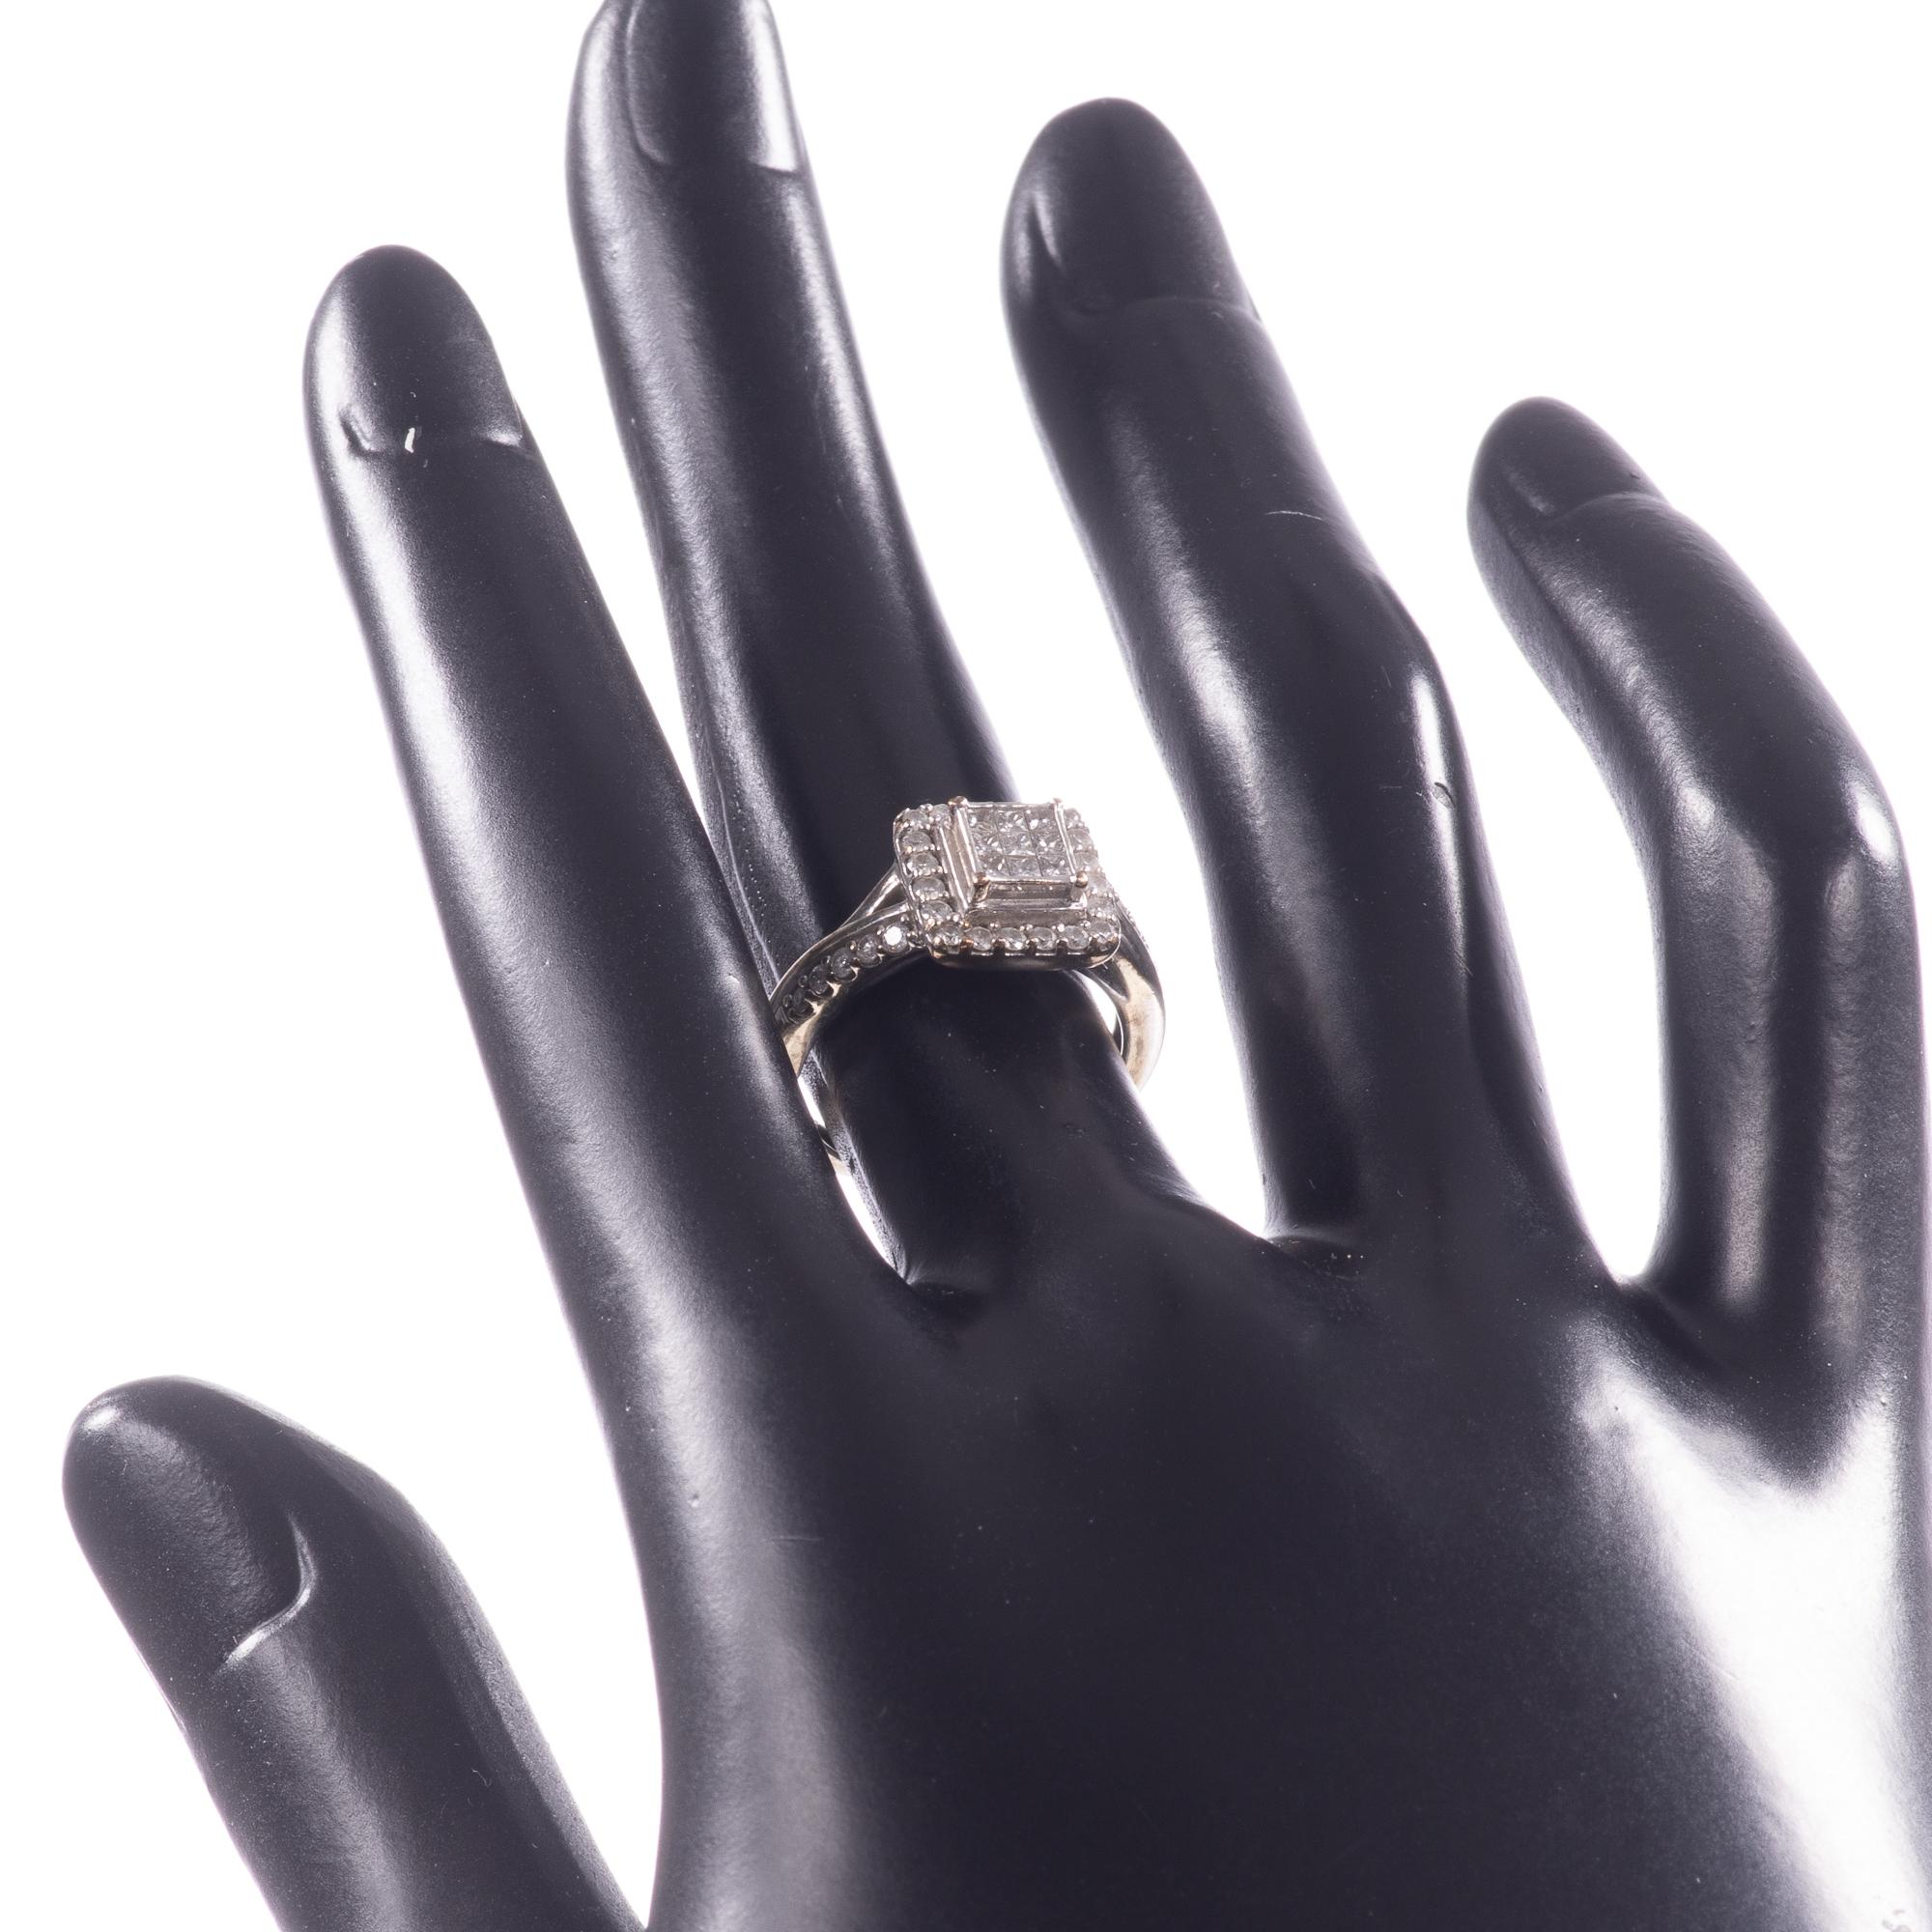 9ct White Gold 0.40ct Diamond Ring - Image 2 of 6